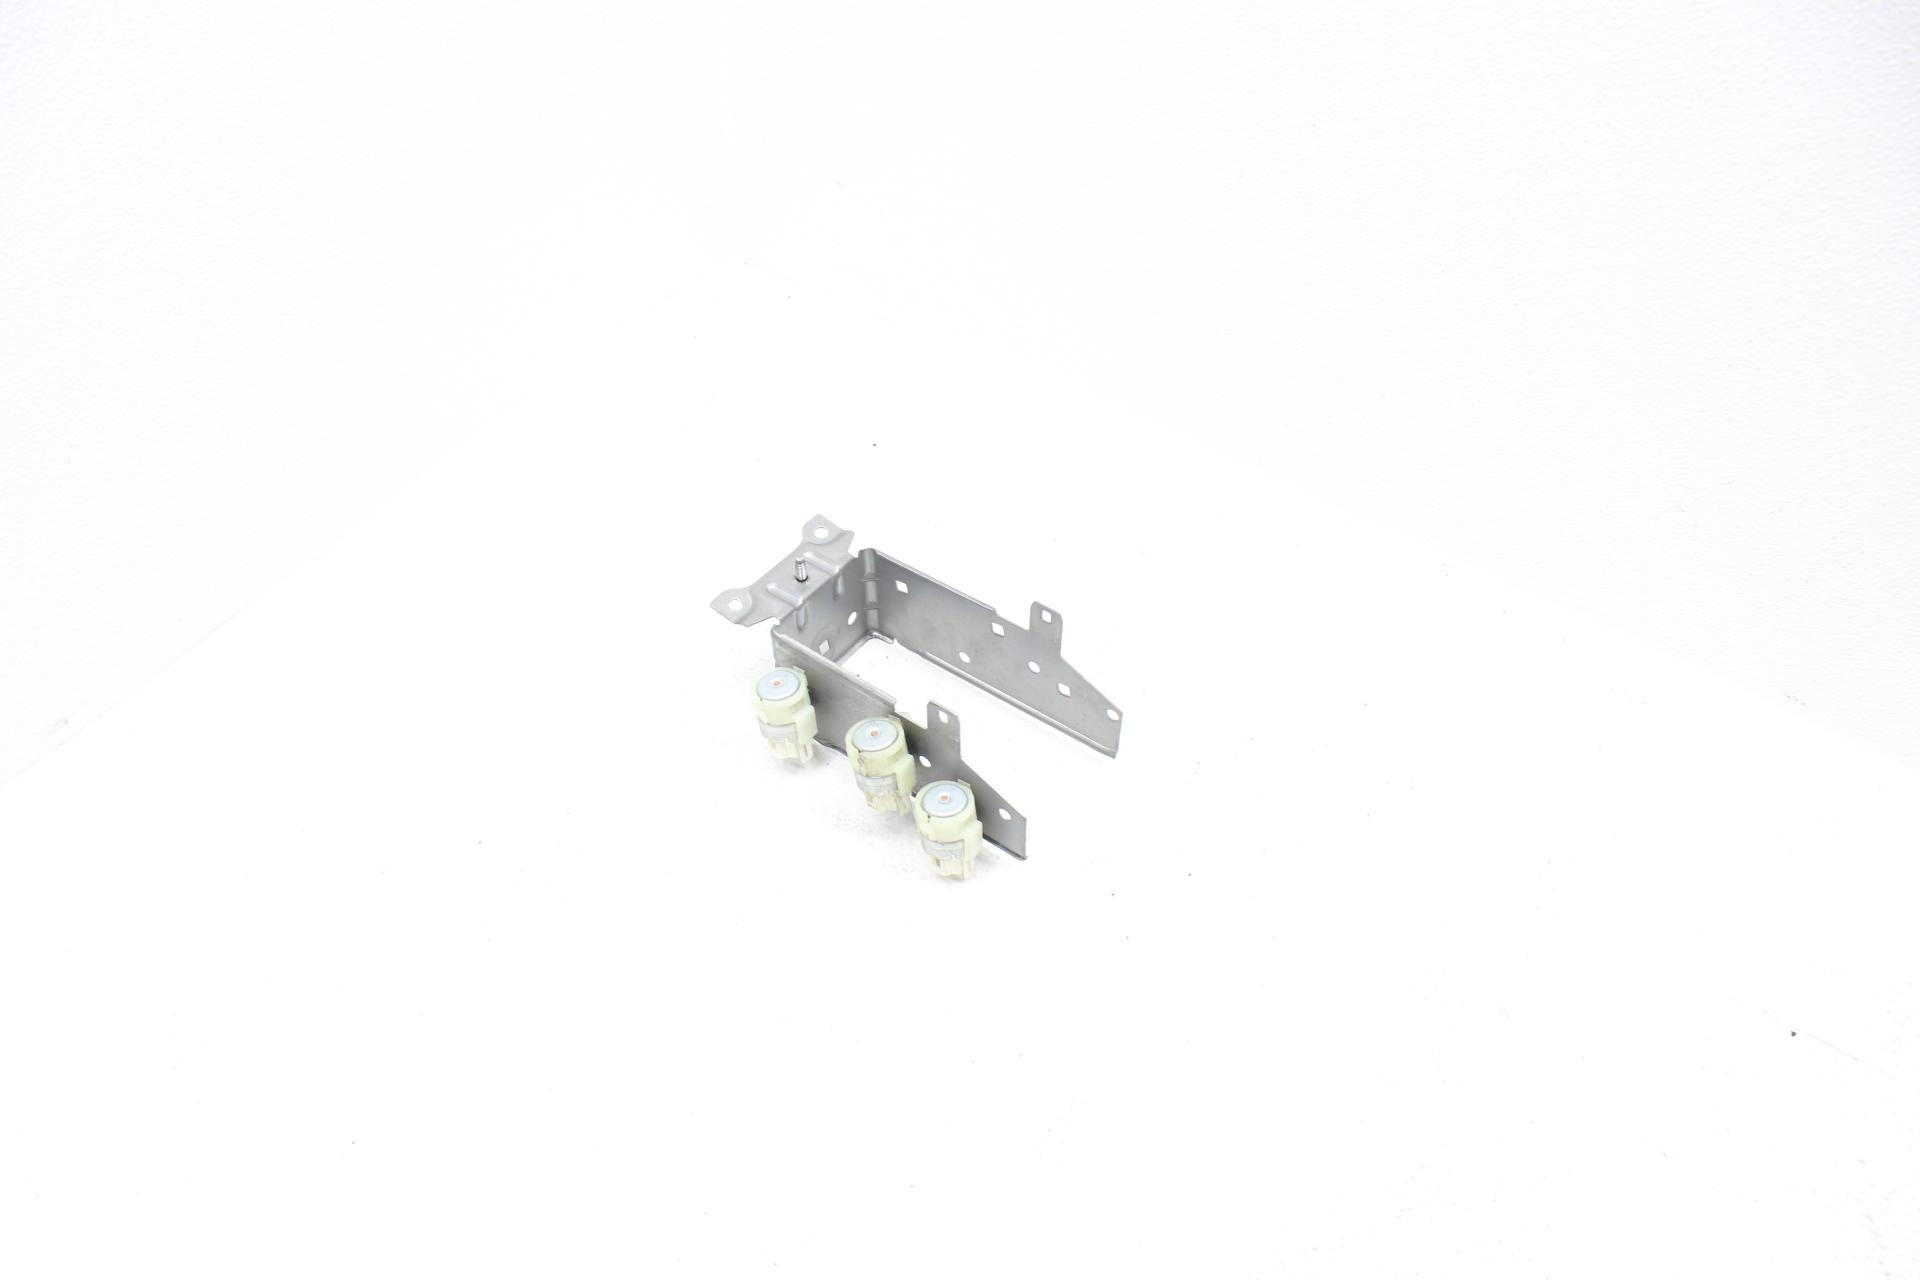 hight resolution of 2005 2007 subaru impreza wrx sti interior fuse box panel mounting bracket oem 05 07